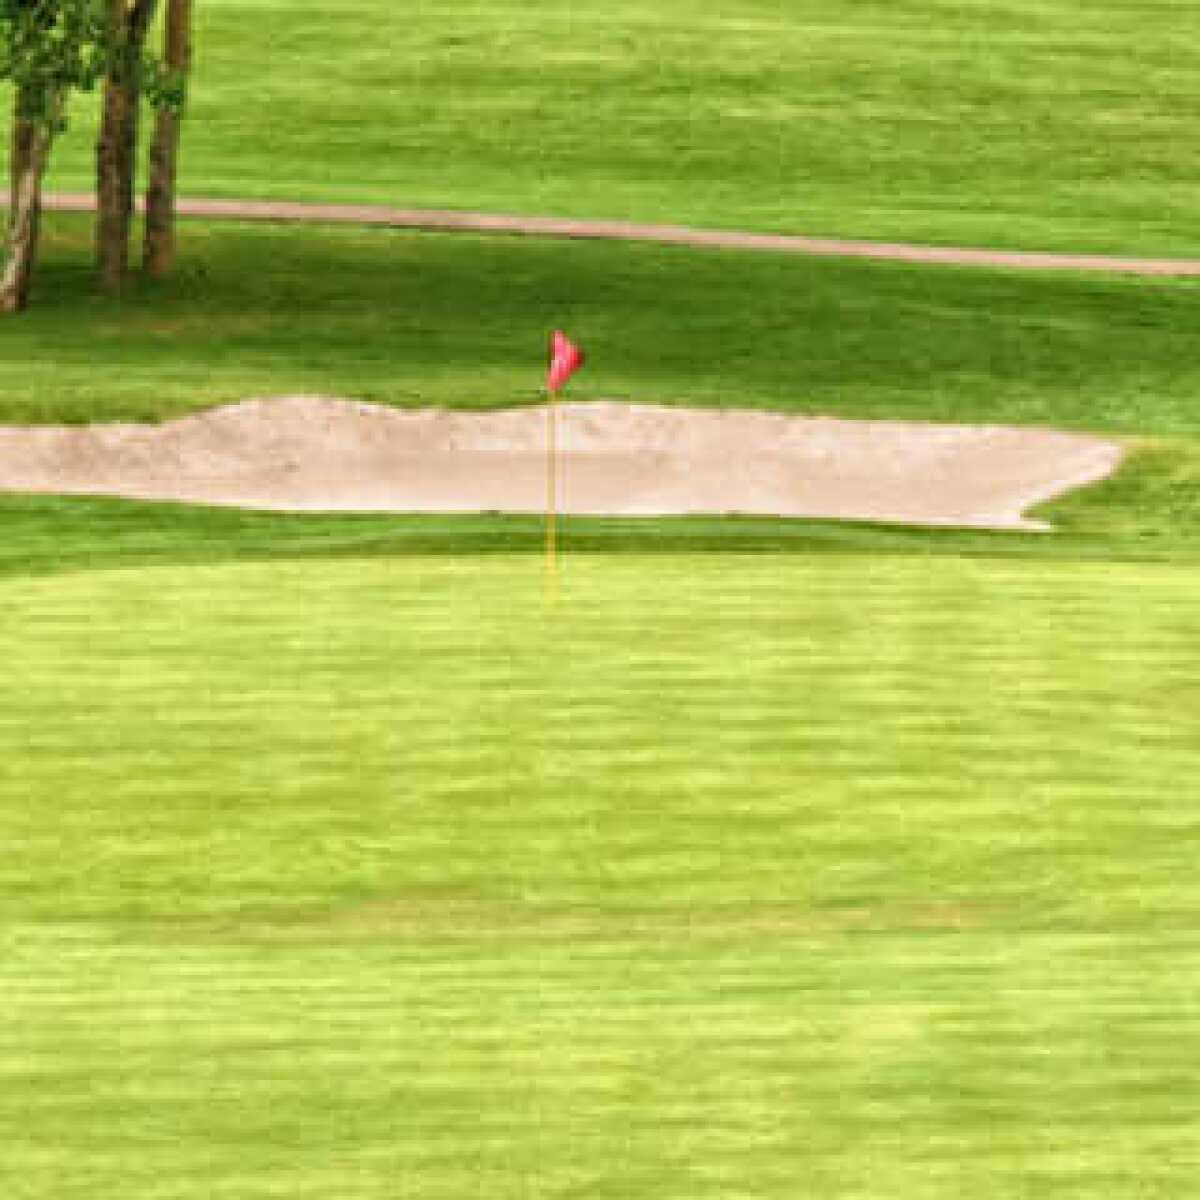 Pine Ridge Golf Club - Little Pine in Beverly Hills ...